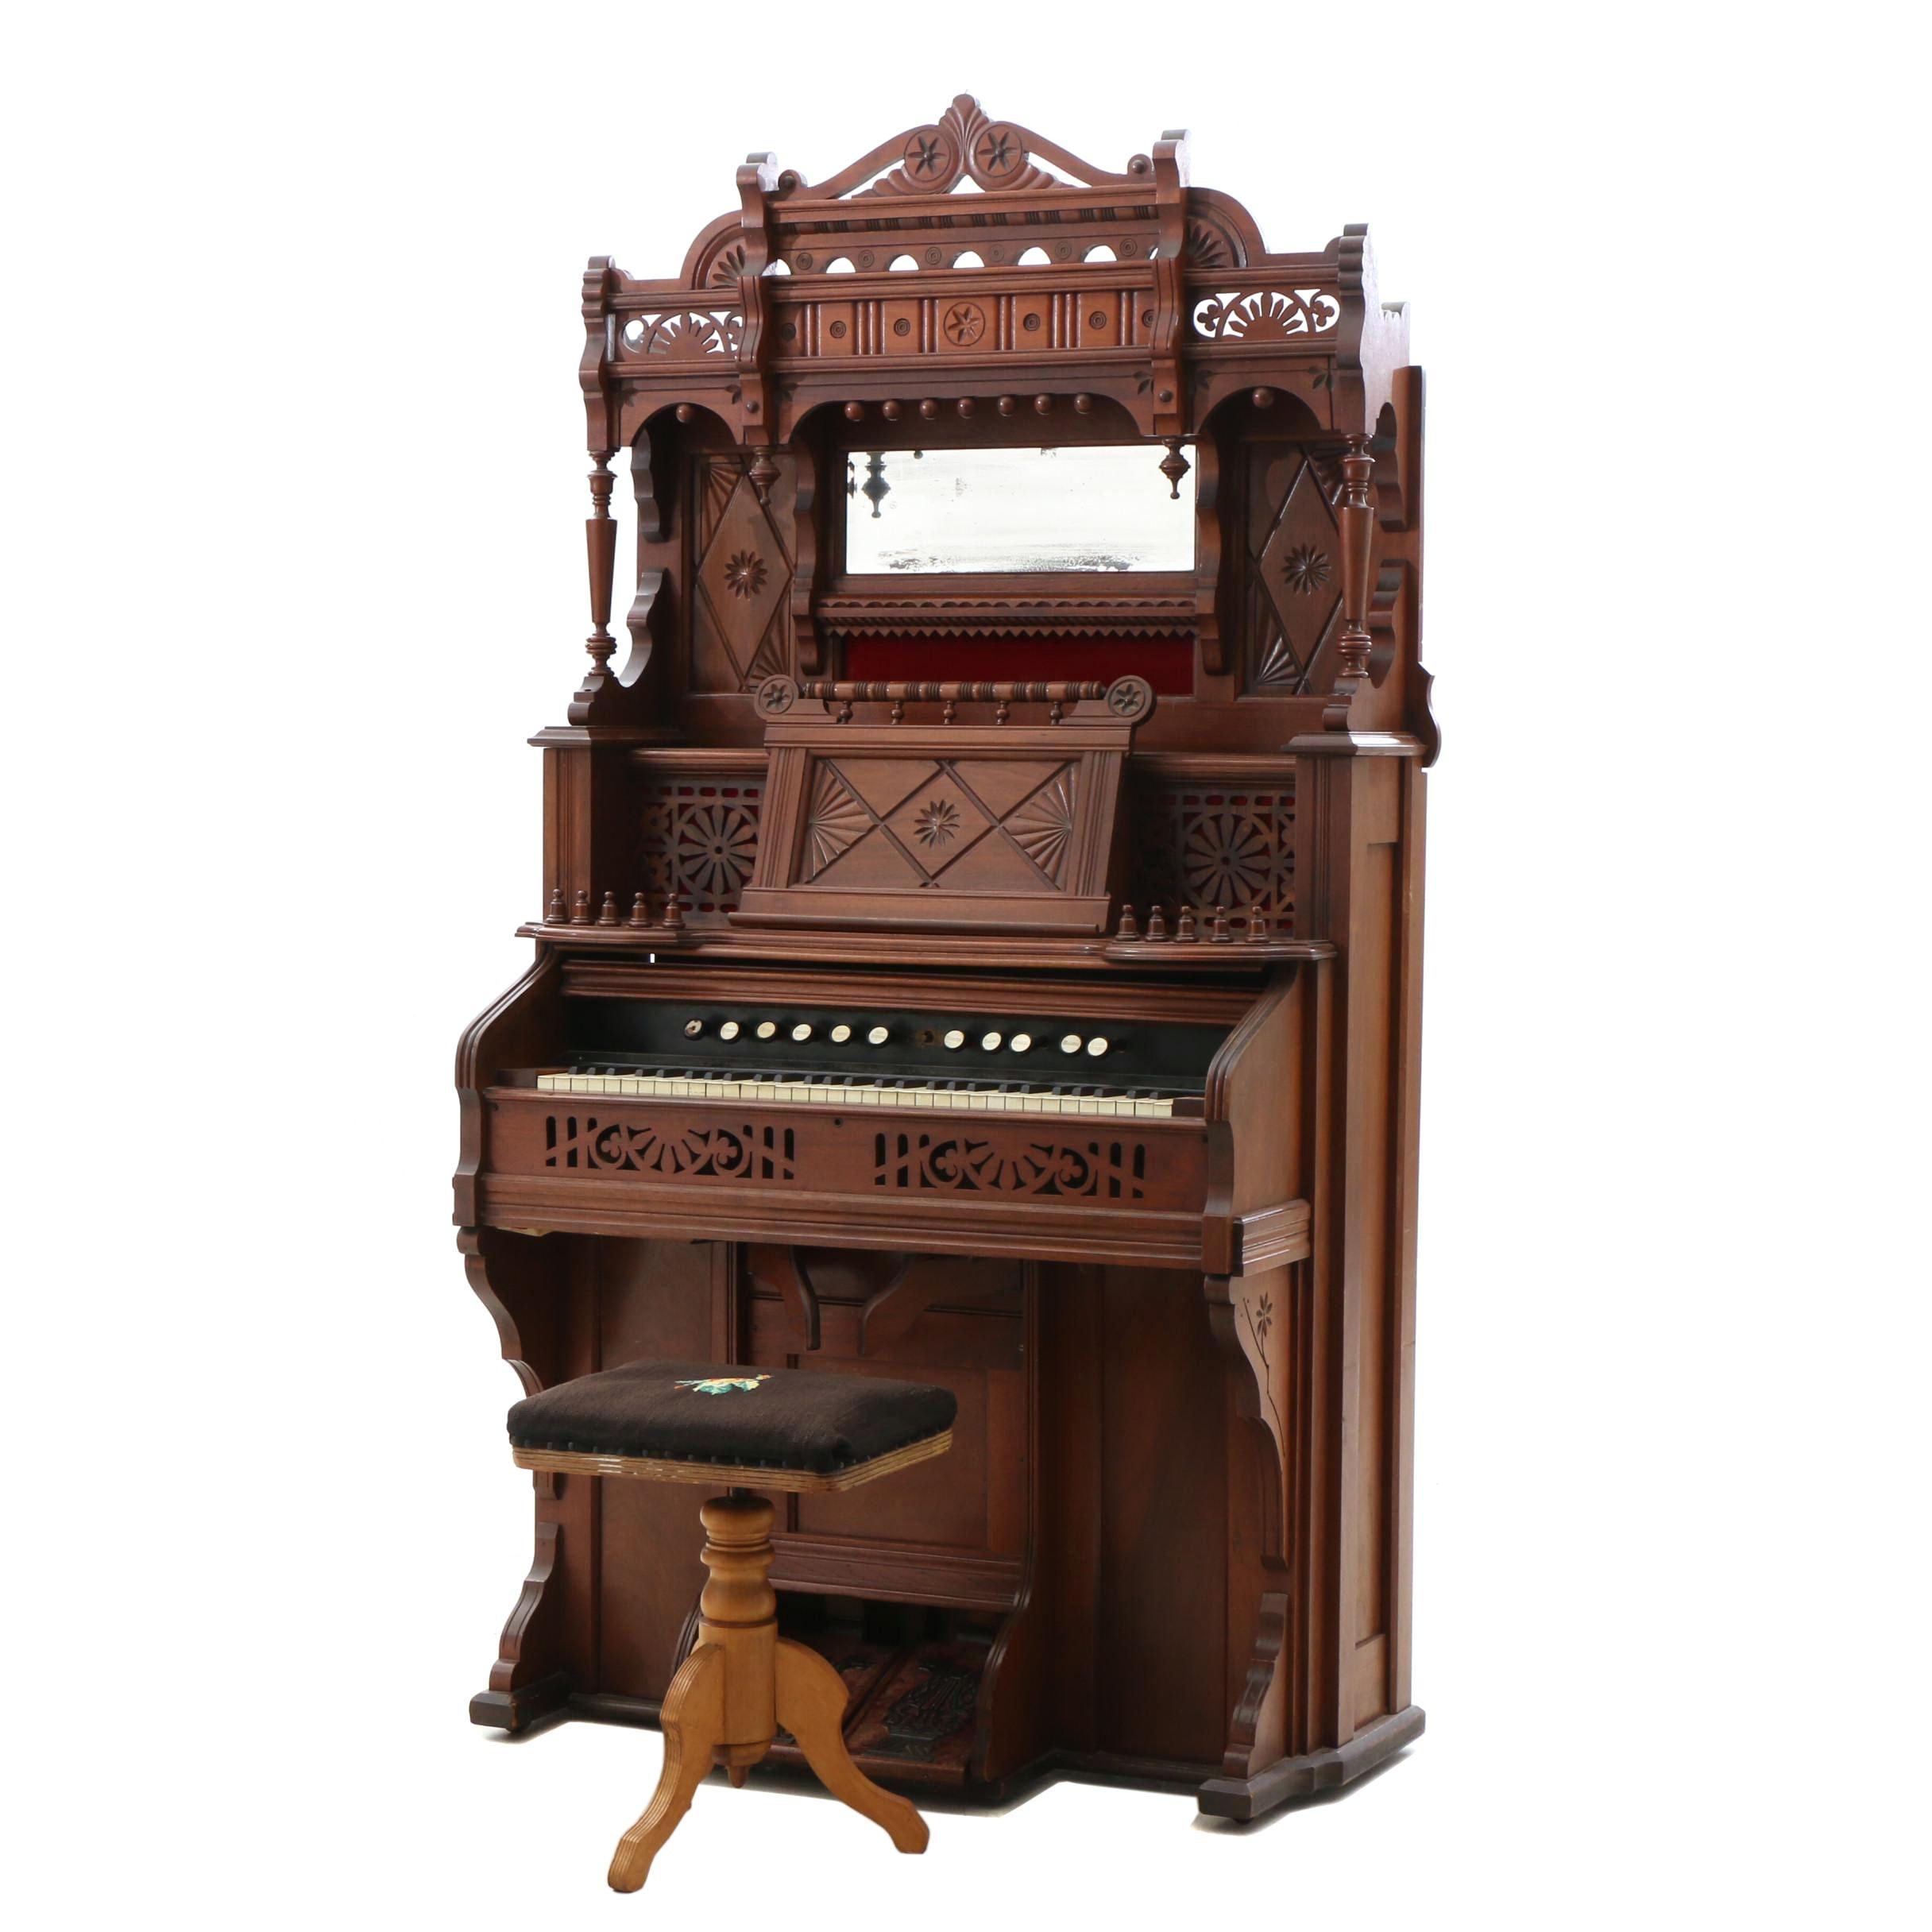 Victorian Pump Organ by Chicago Cottage Organ Company